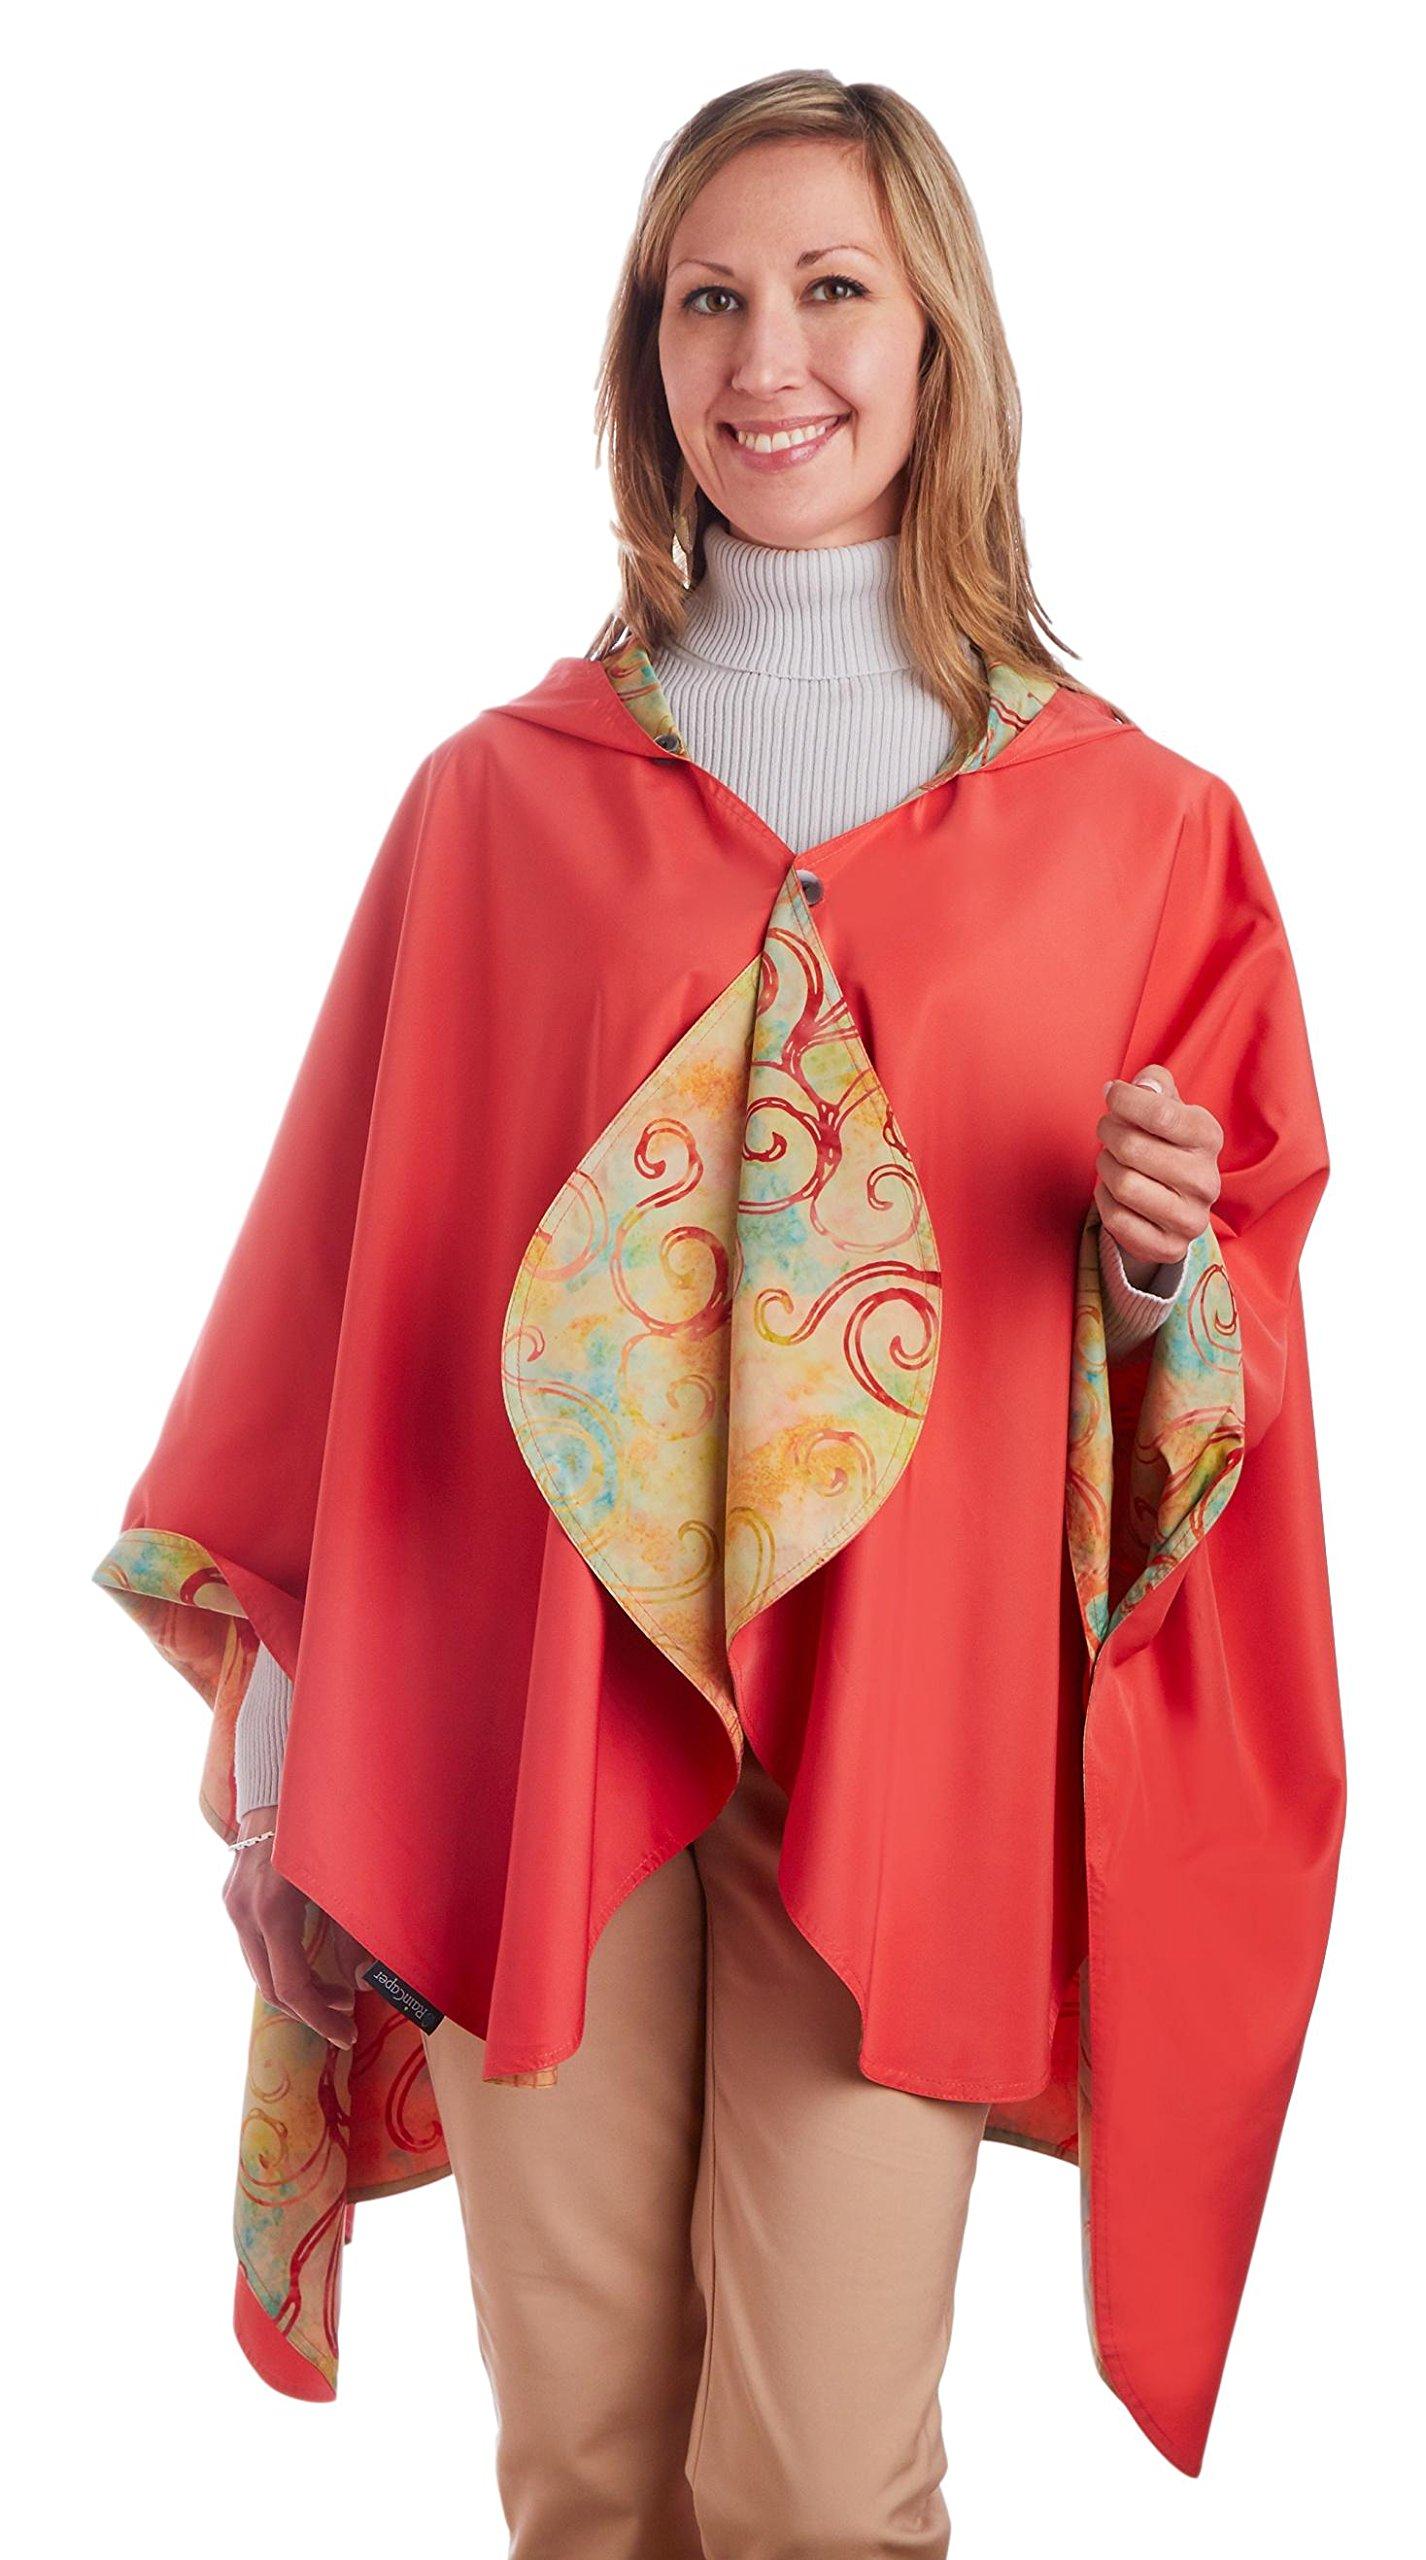 RainCaper Rain Poncho for Women - Reversible Rainproof Hooded Cape in Gorgeous Ultrasoft Colors (Coral & Watercolor)